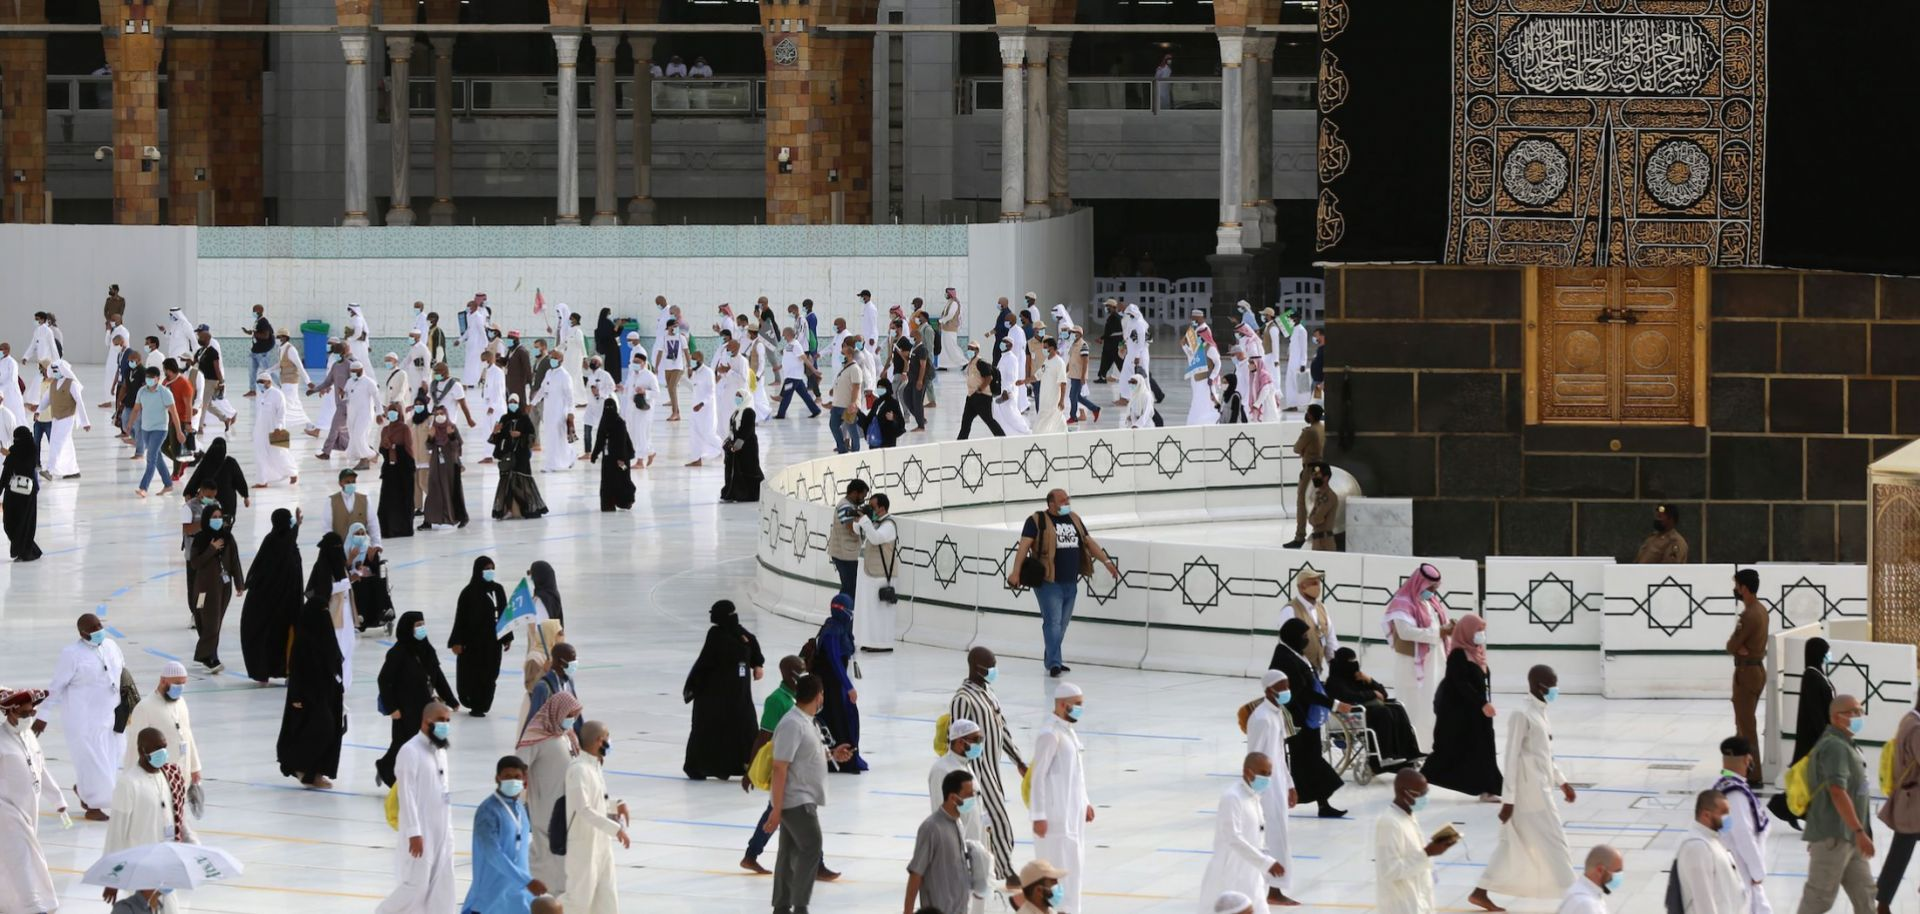 Hajj pilgrims gather around the Kaaba in the holy city of Mecca, Saudi Arabia, on Aug. 2, 2020.